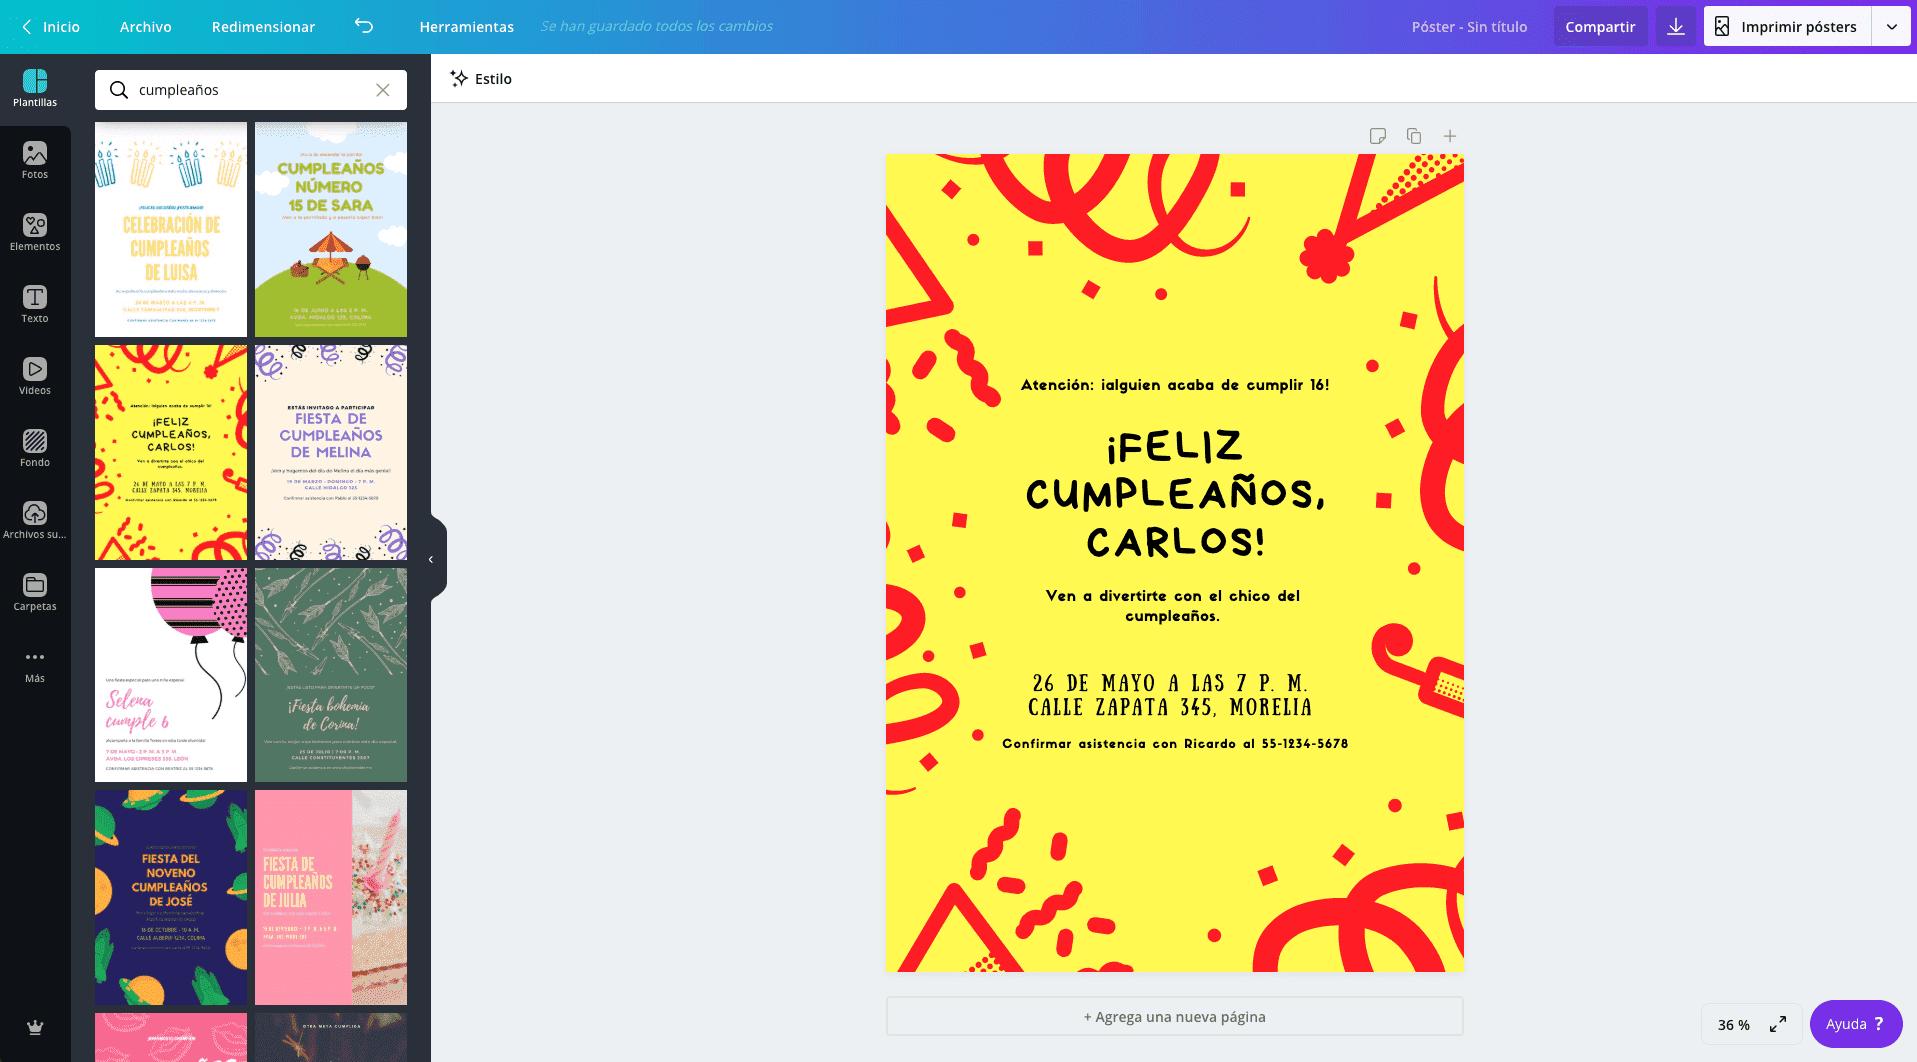 Carteles de cumpleaños